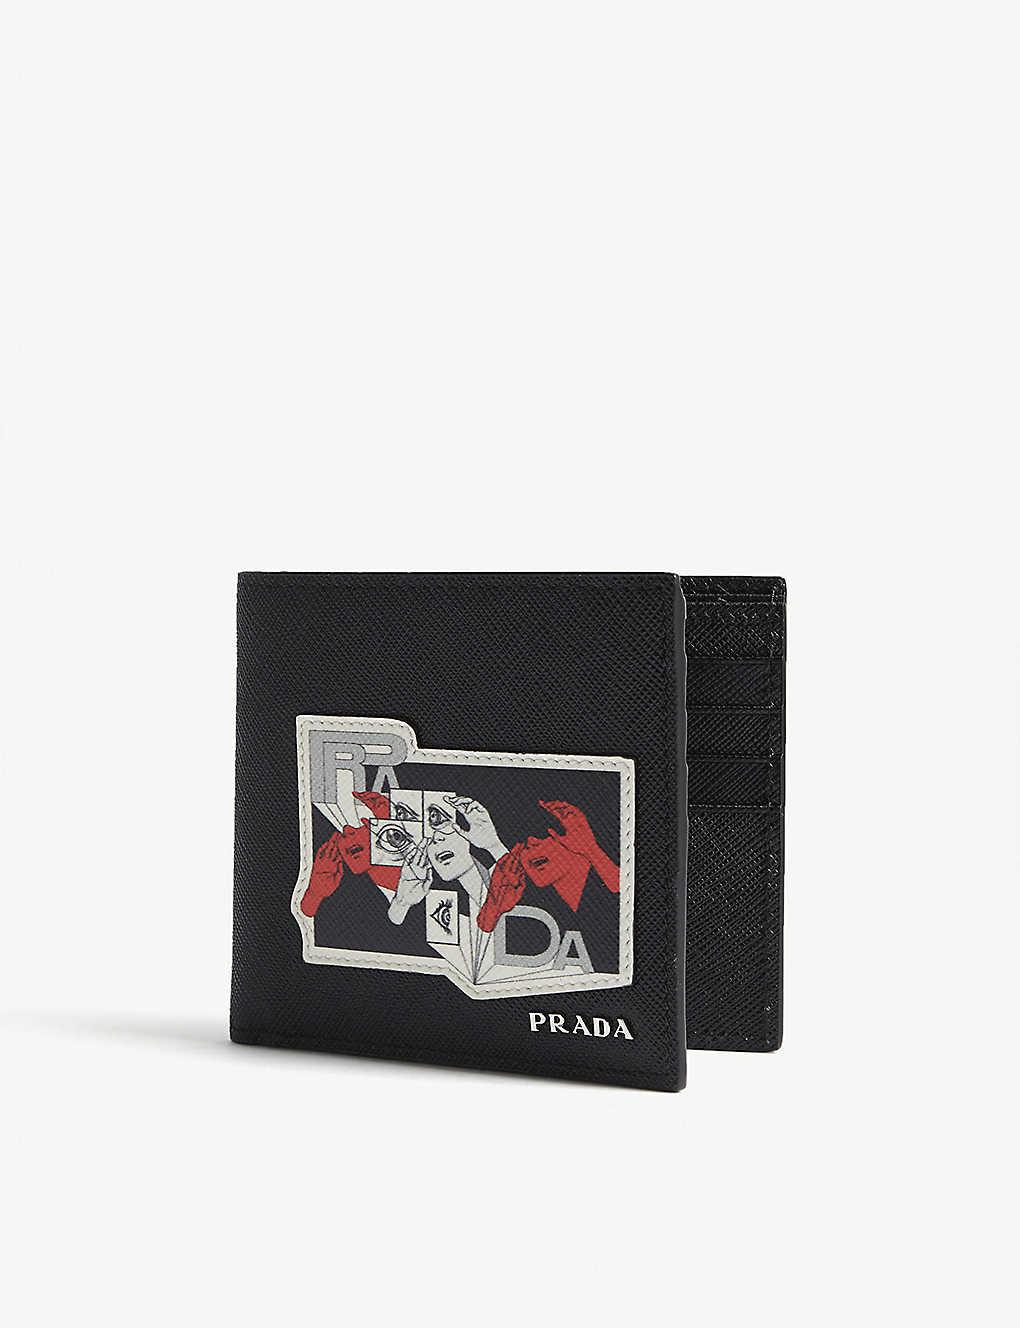 4387da4797f5 PRADA - Eye patch Saffiano leather wallet | Selfridges.com